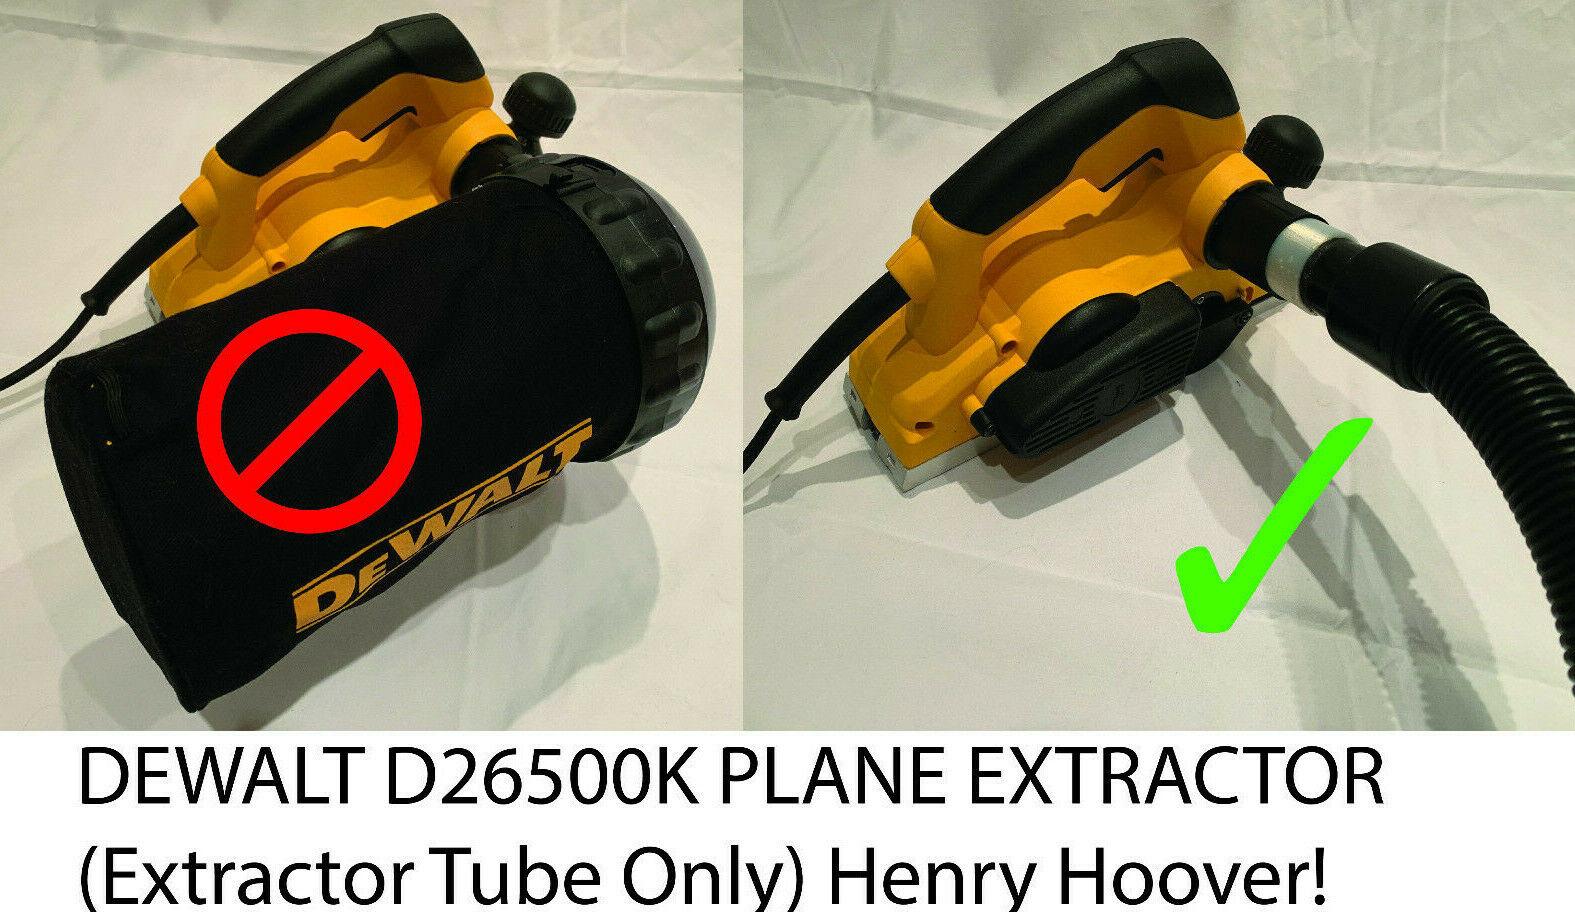 1050W Power Tool with Kitbox D26500K Dewalt® 240 Volt Professional 82mm Planer